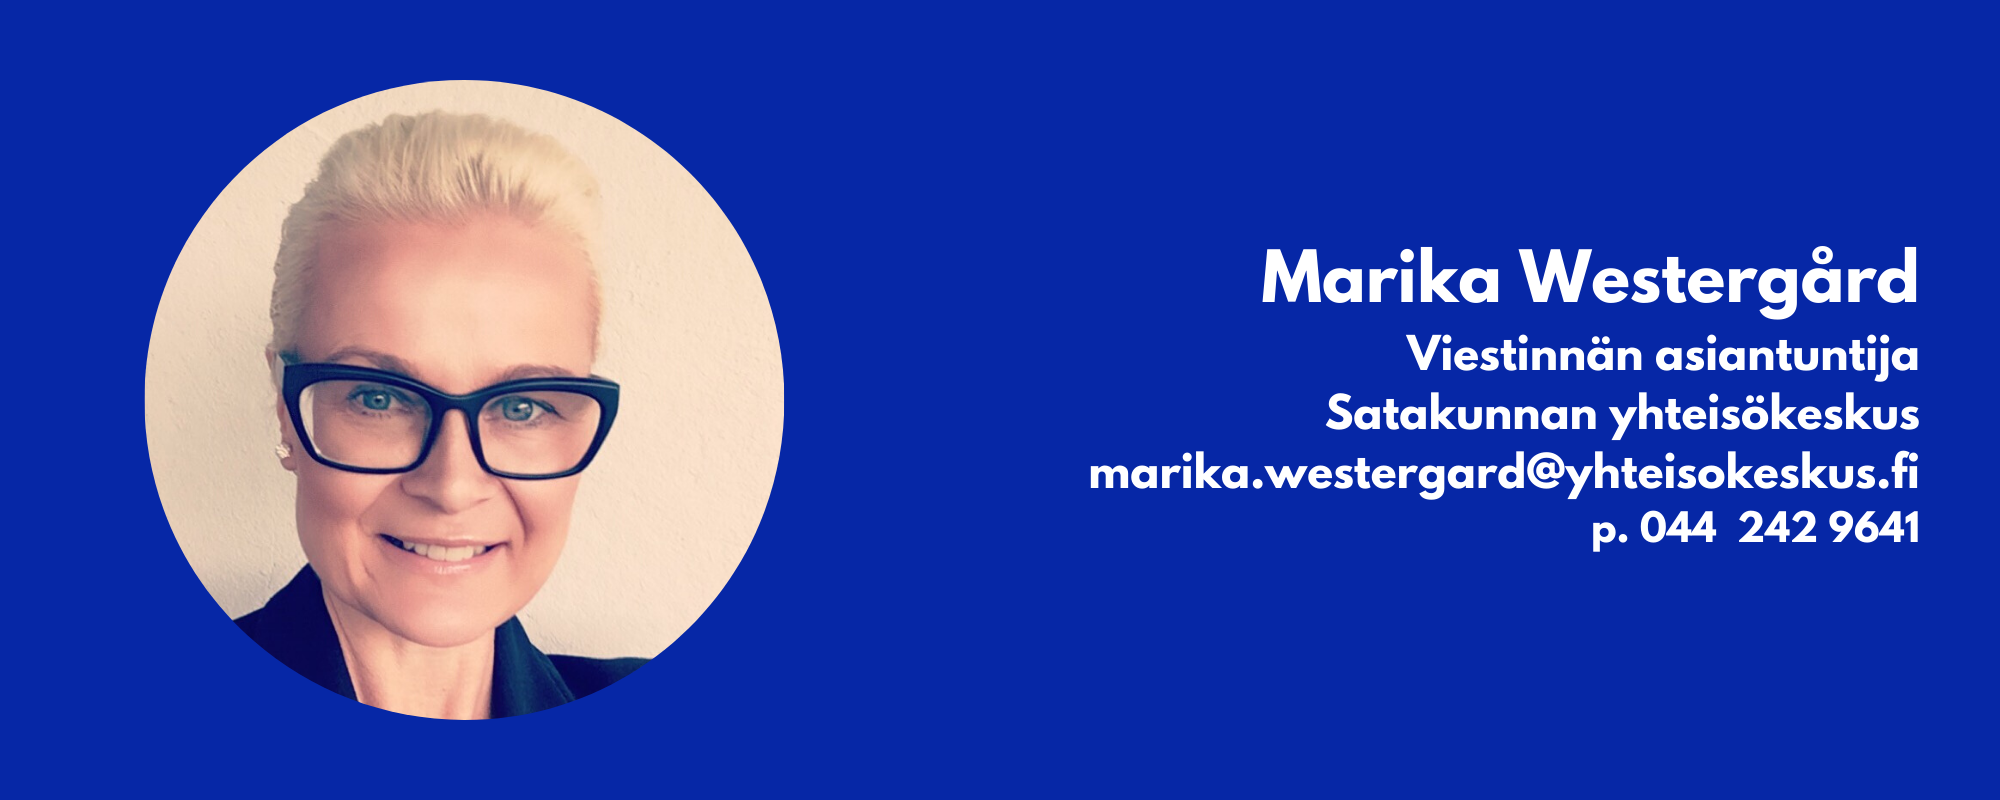 Marika Westergård Viestinnän asiantuntija